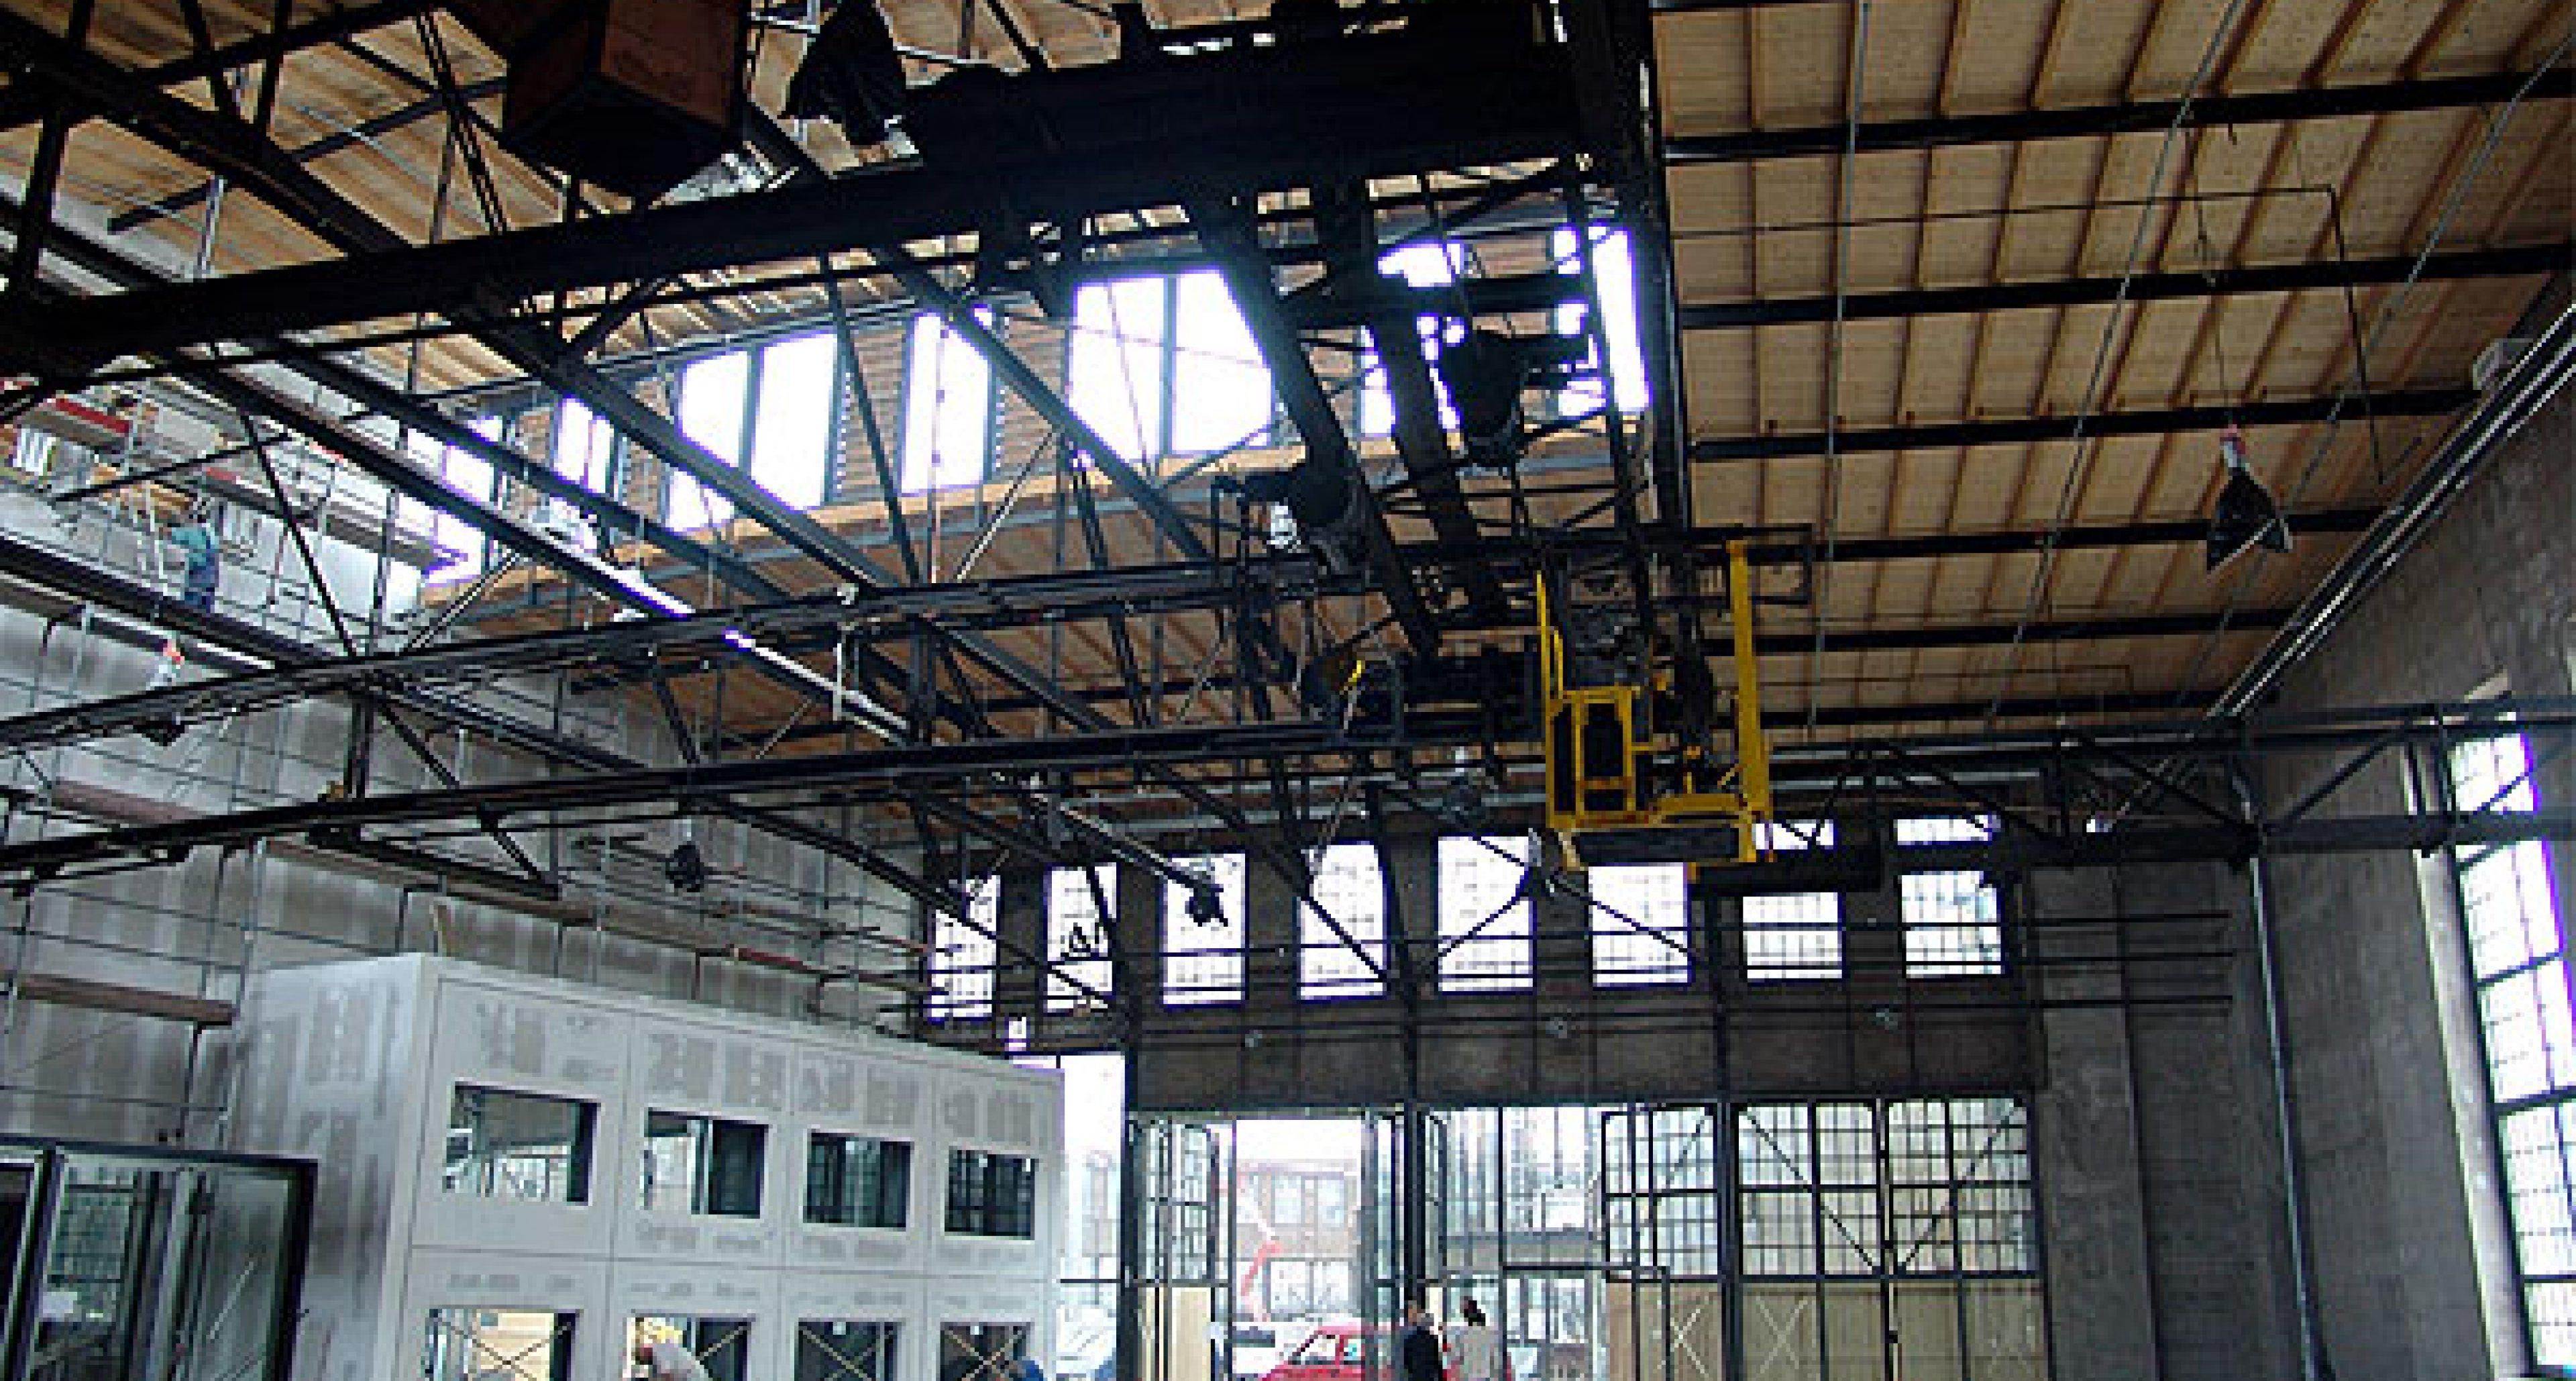 Meilenwerk Düsseldorf: Bahn frei!